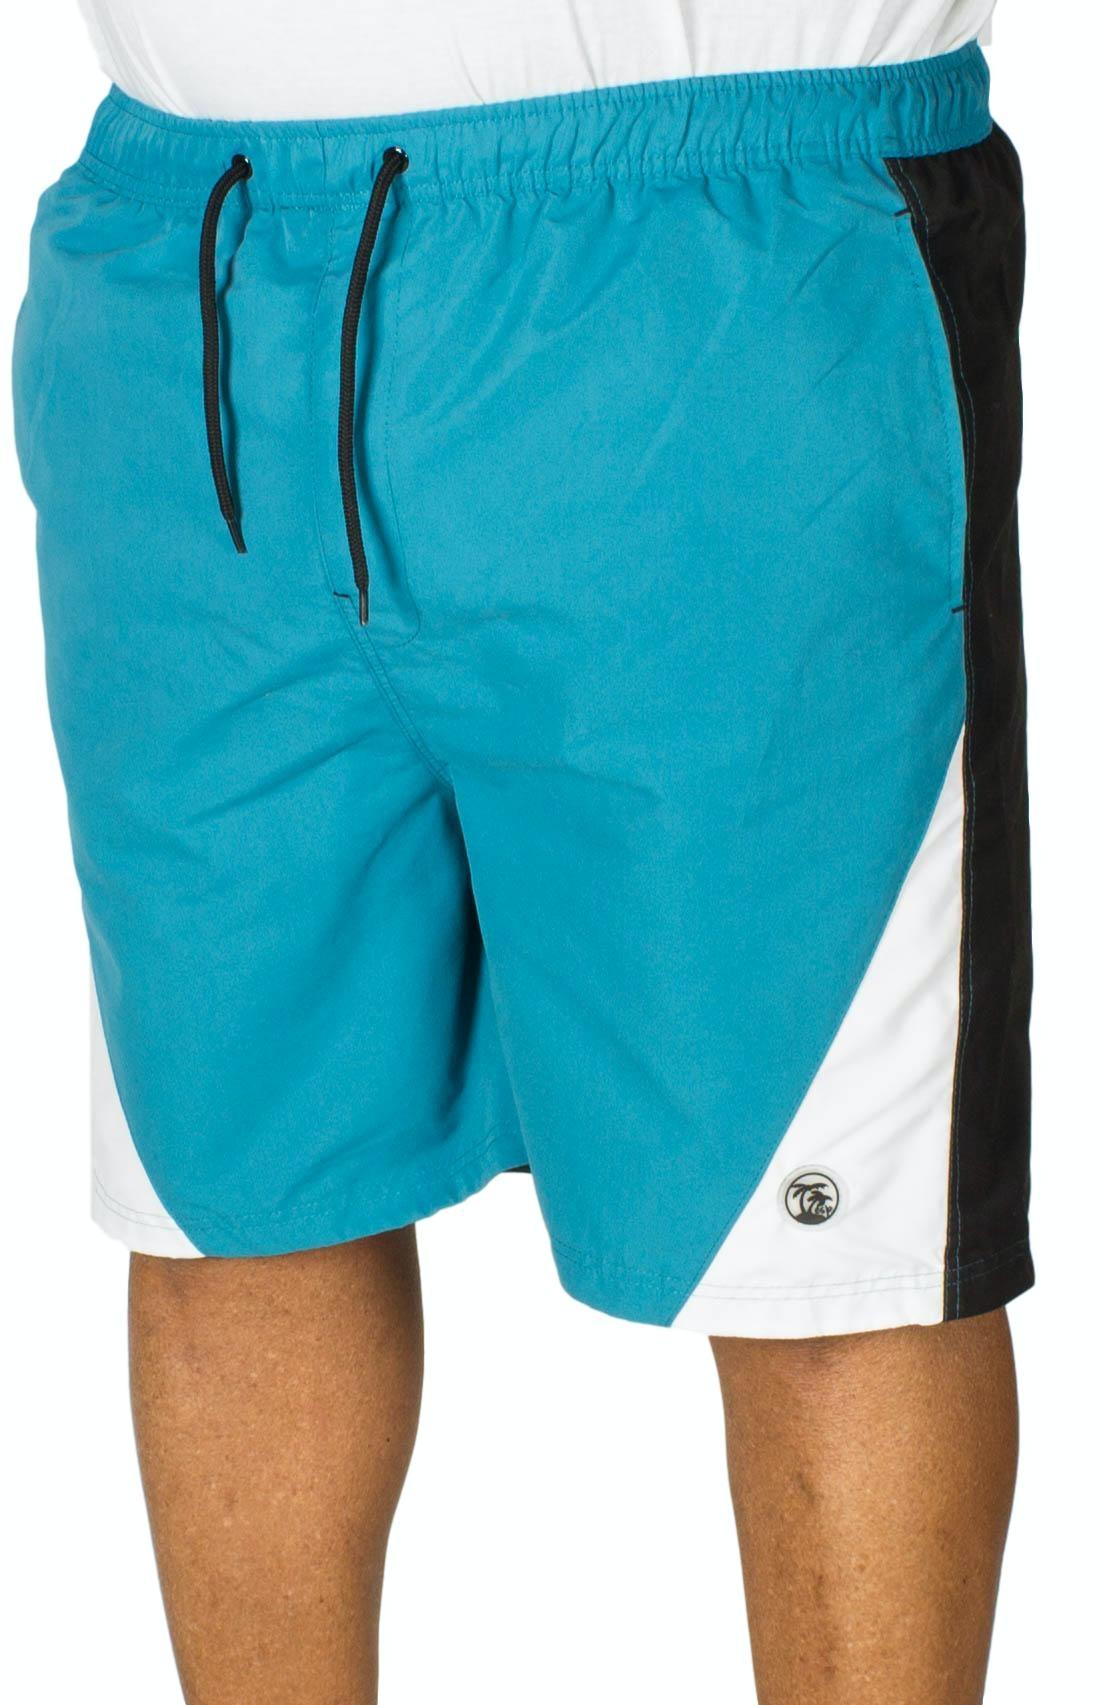 Espionage Cut And Sew Swim Shorts Teal/Black